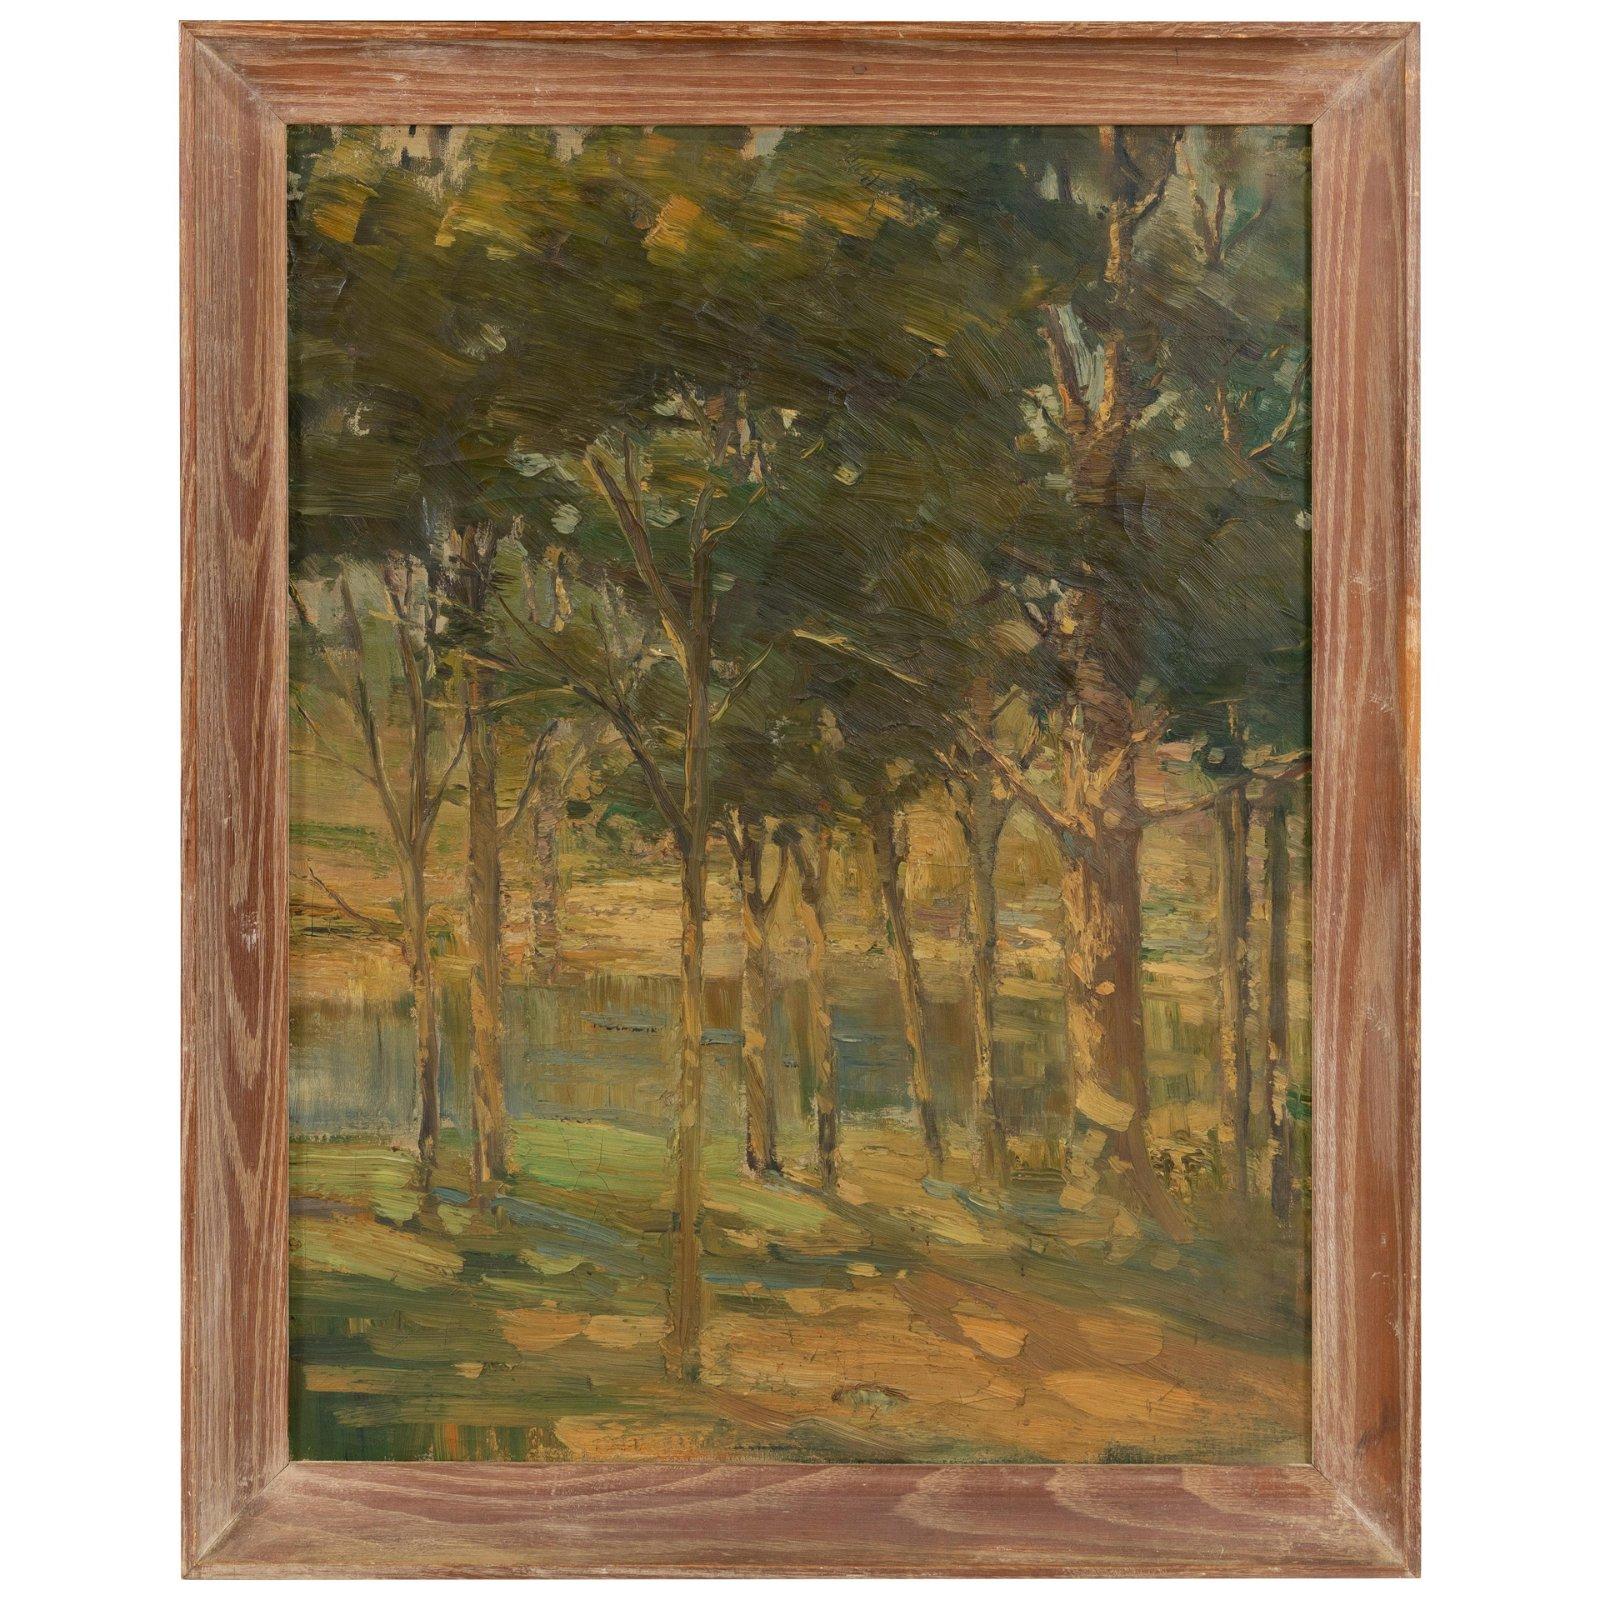 Woodland Landscape - Oil on Canvas